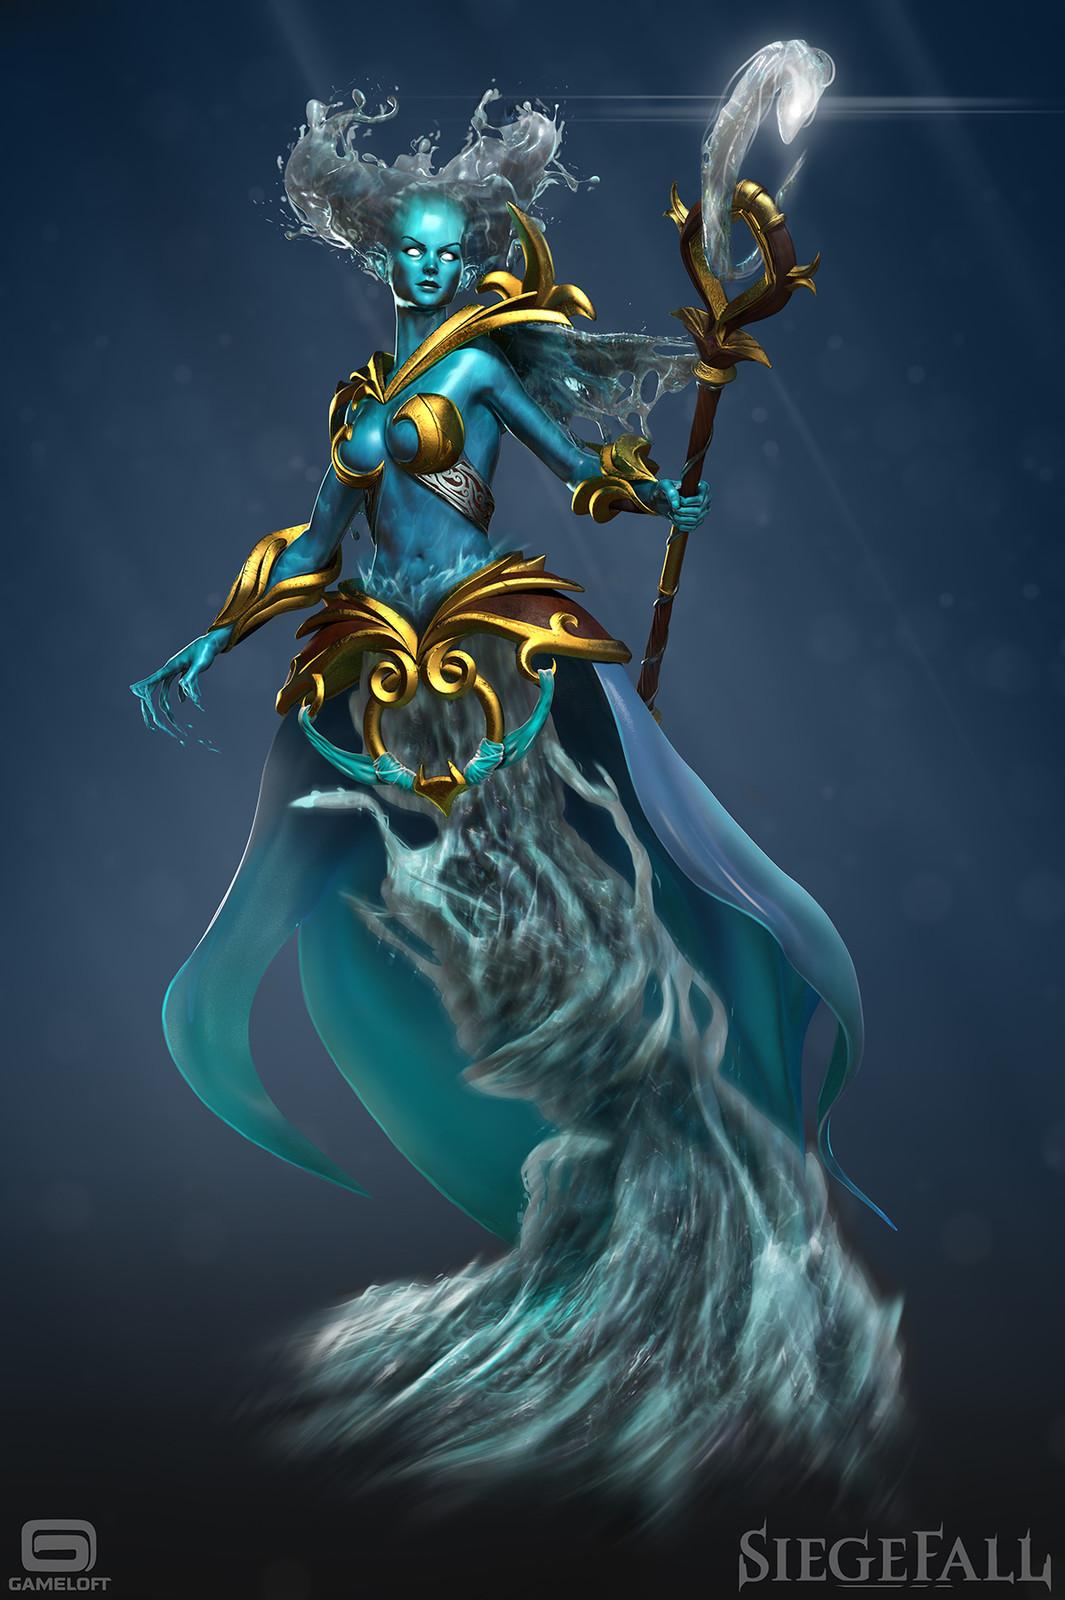 Siegefall - Water Elemental